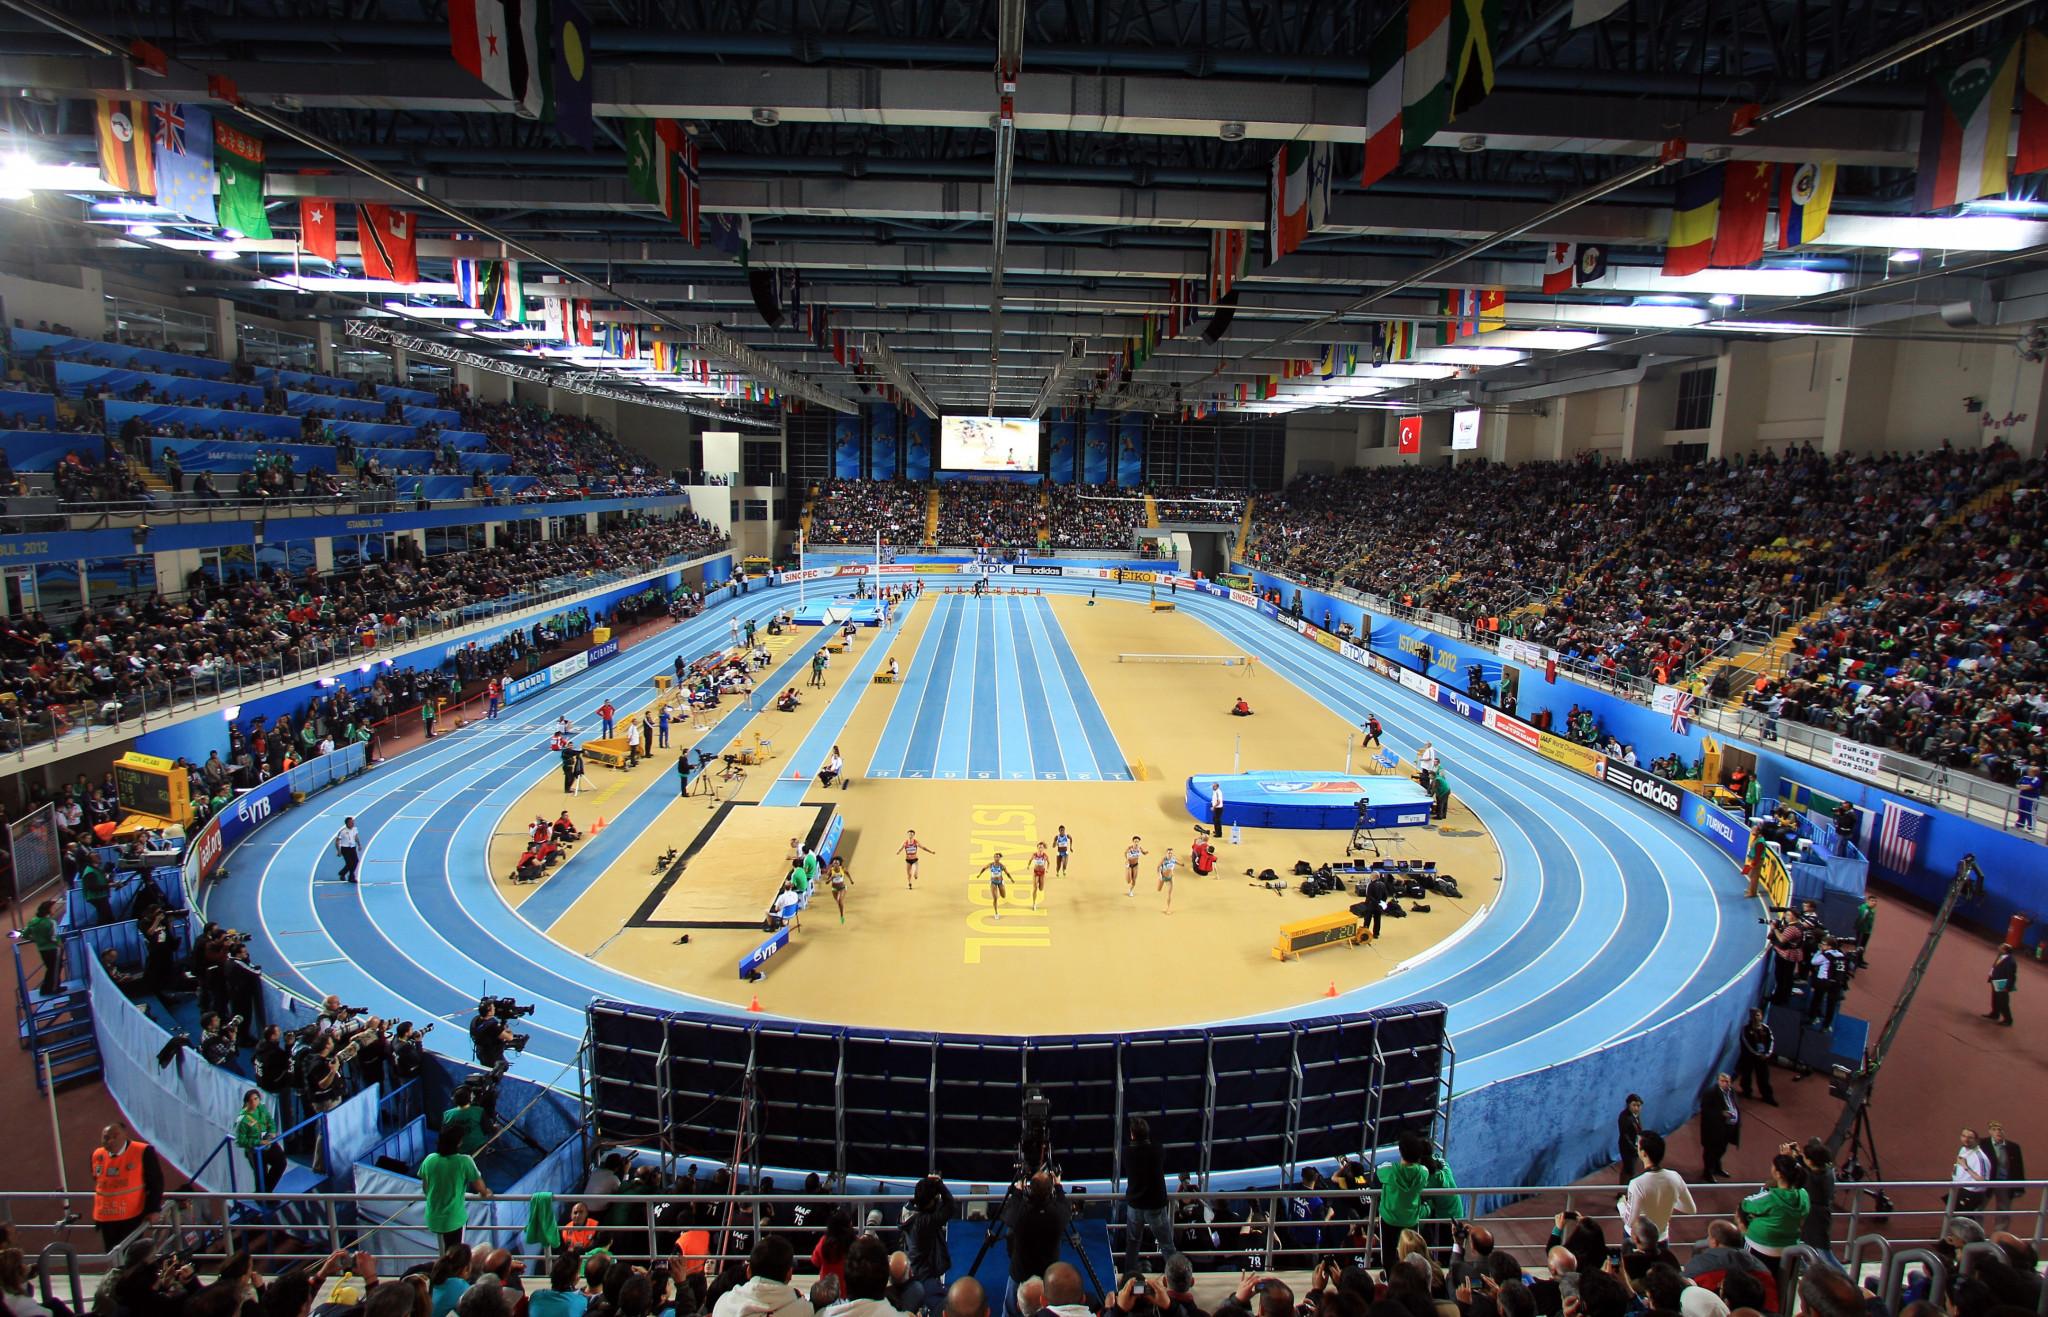 Istanbul to host 2023 European Athletics Indoor Championships